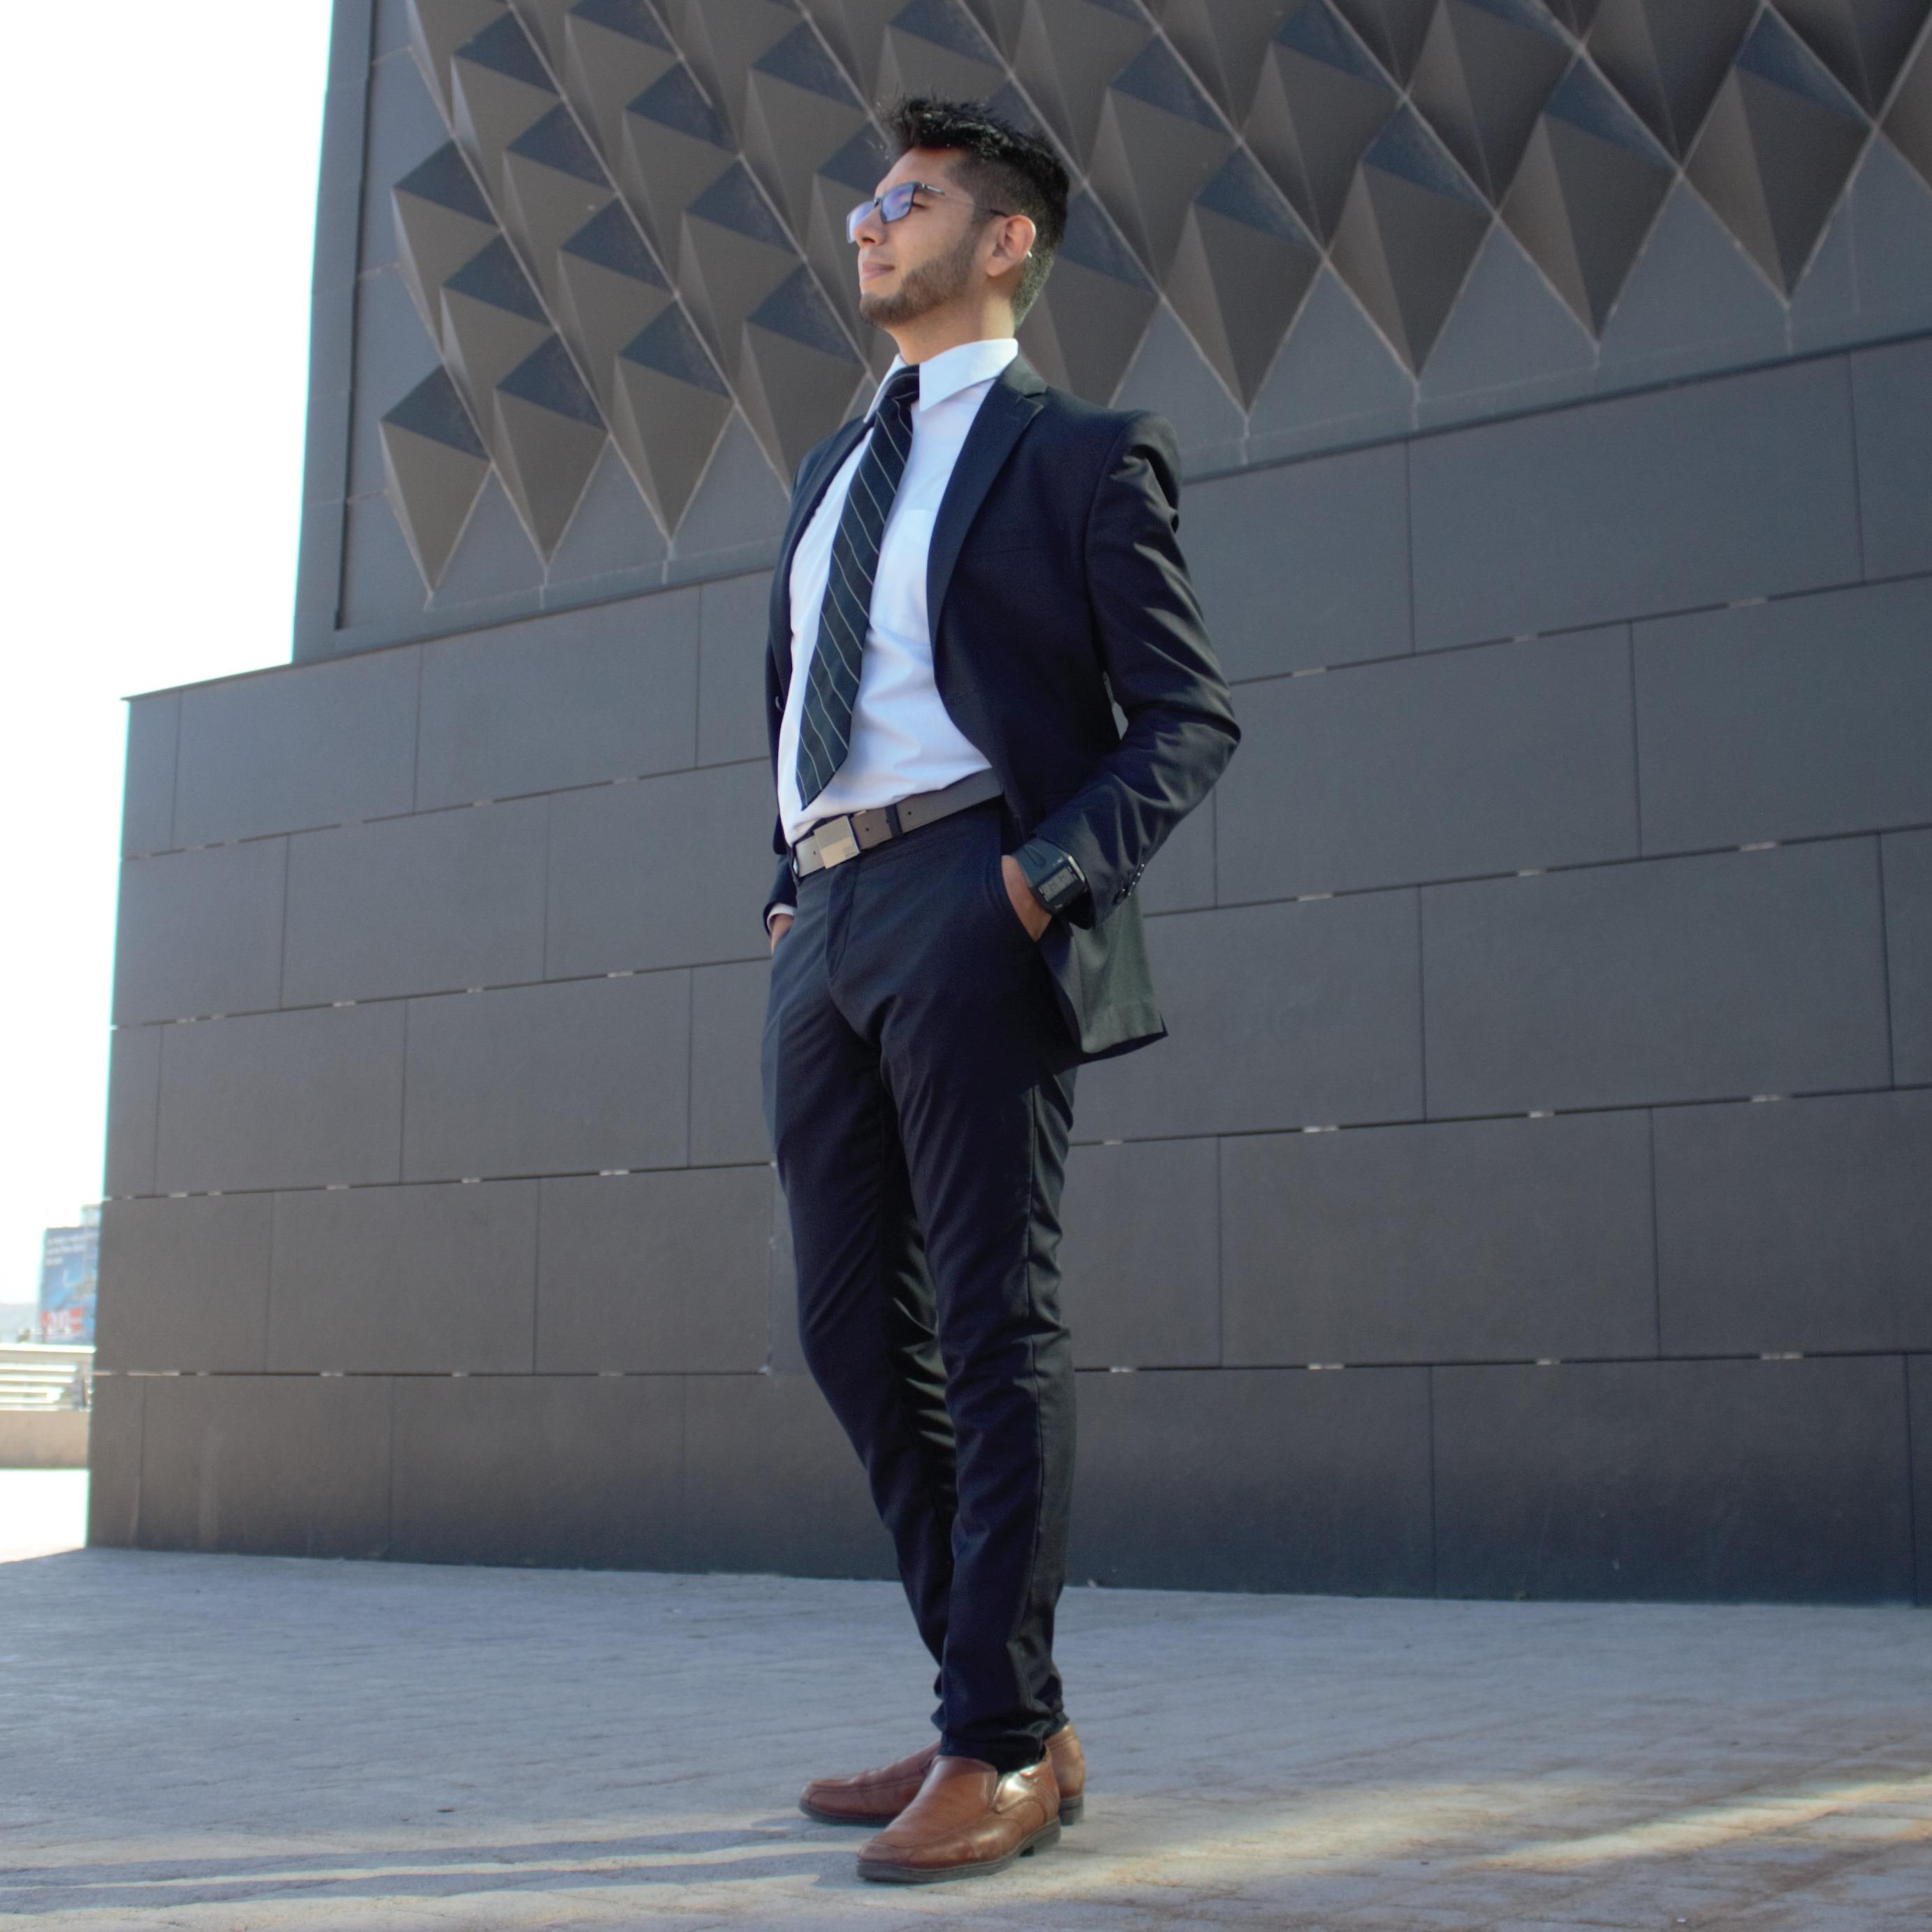 @Juliomontielq Profile Image   Linktree